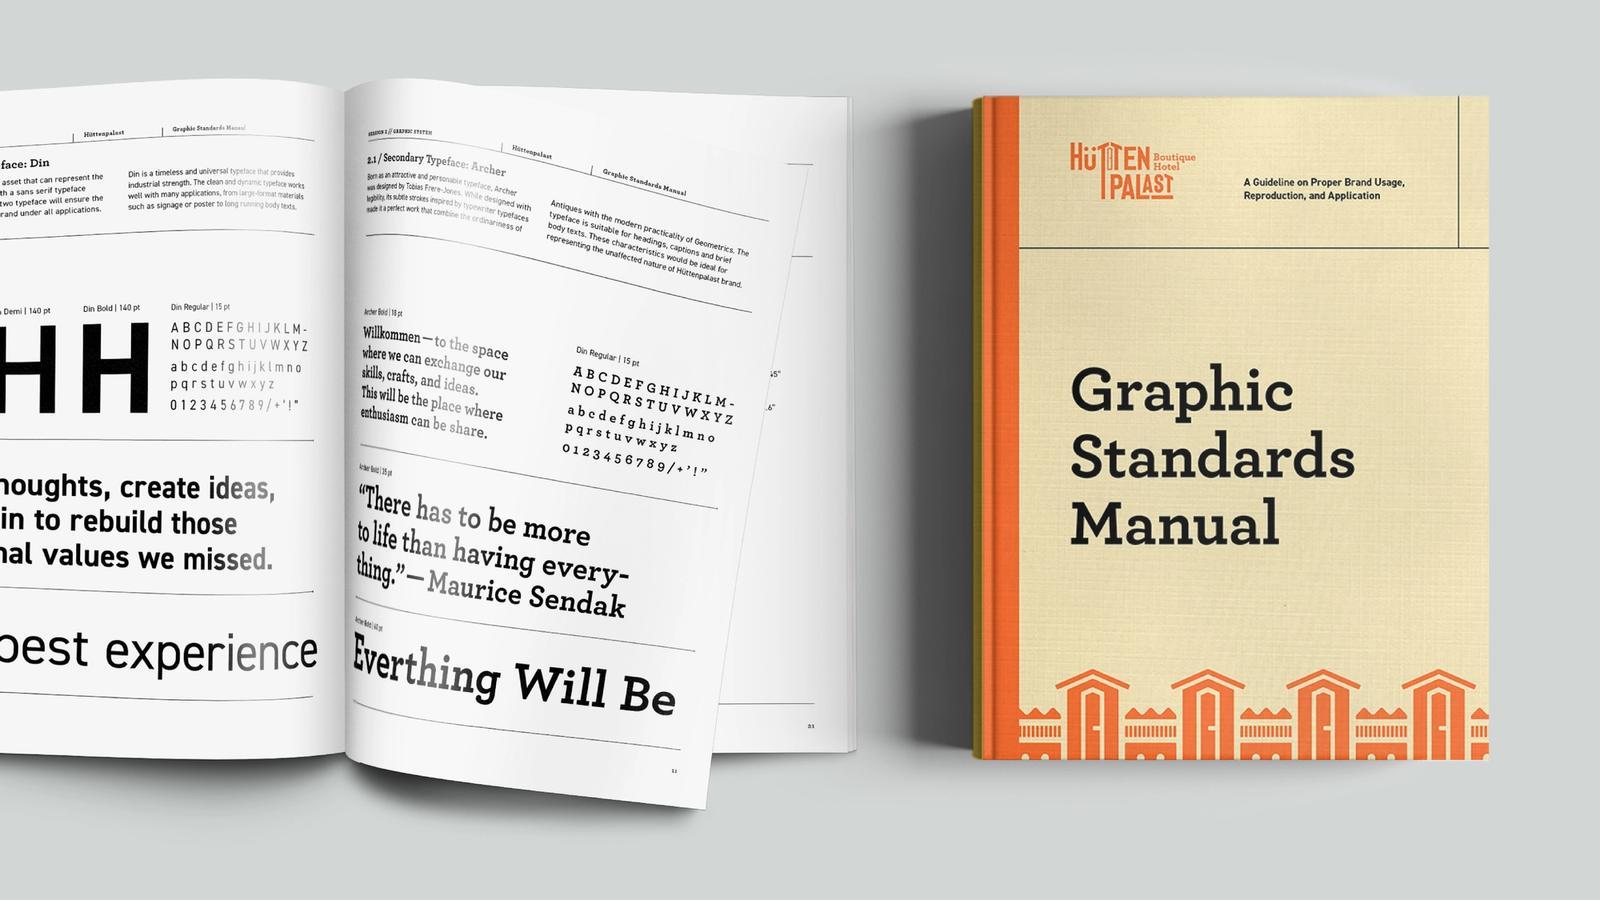 Hüttenpalast Hotel // Graphic Standards Manual